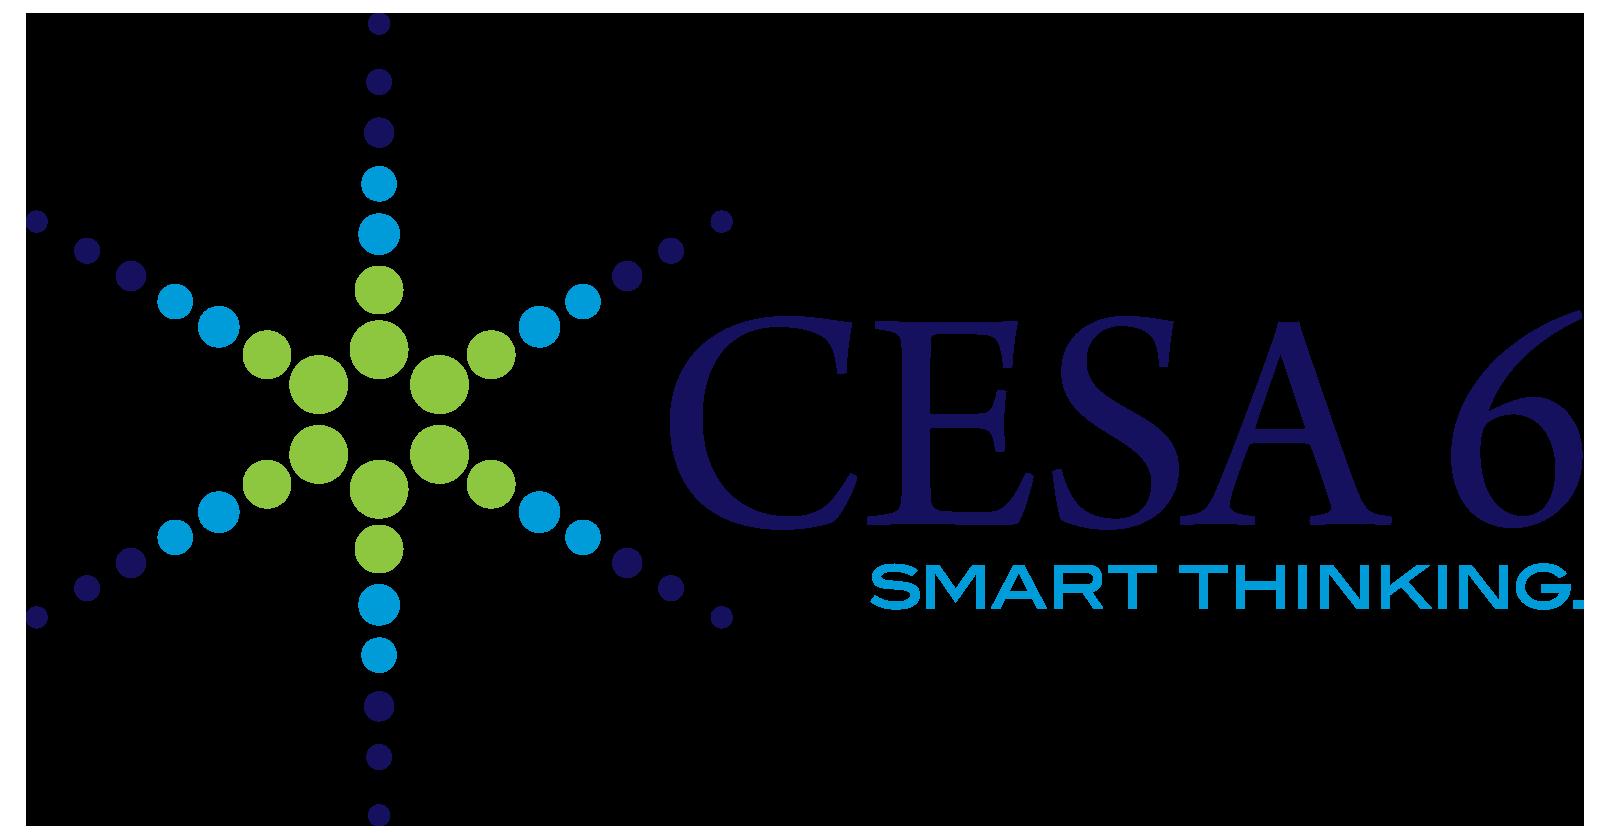 CESA 6 Smart Thinking loog